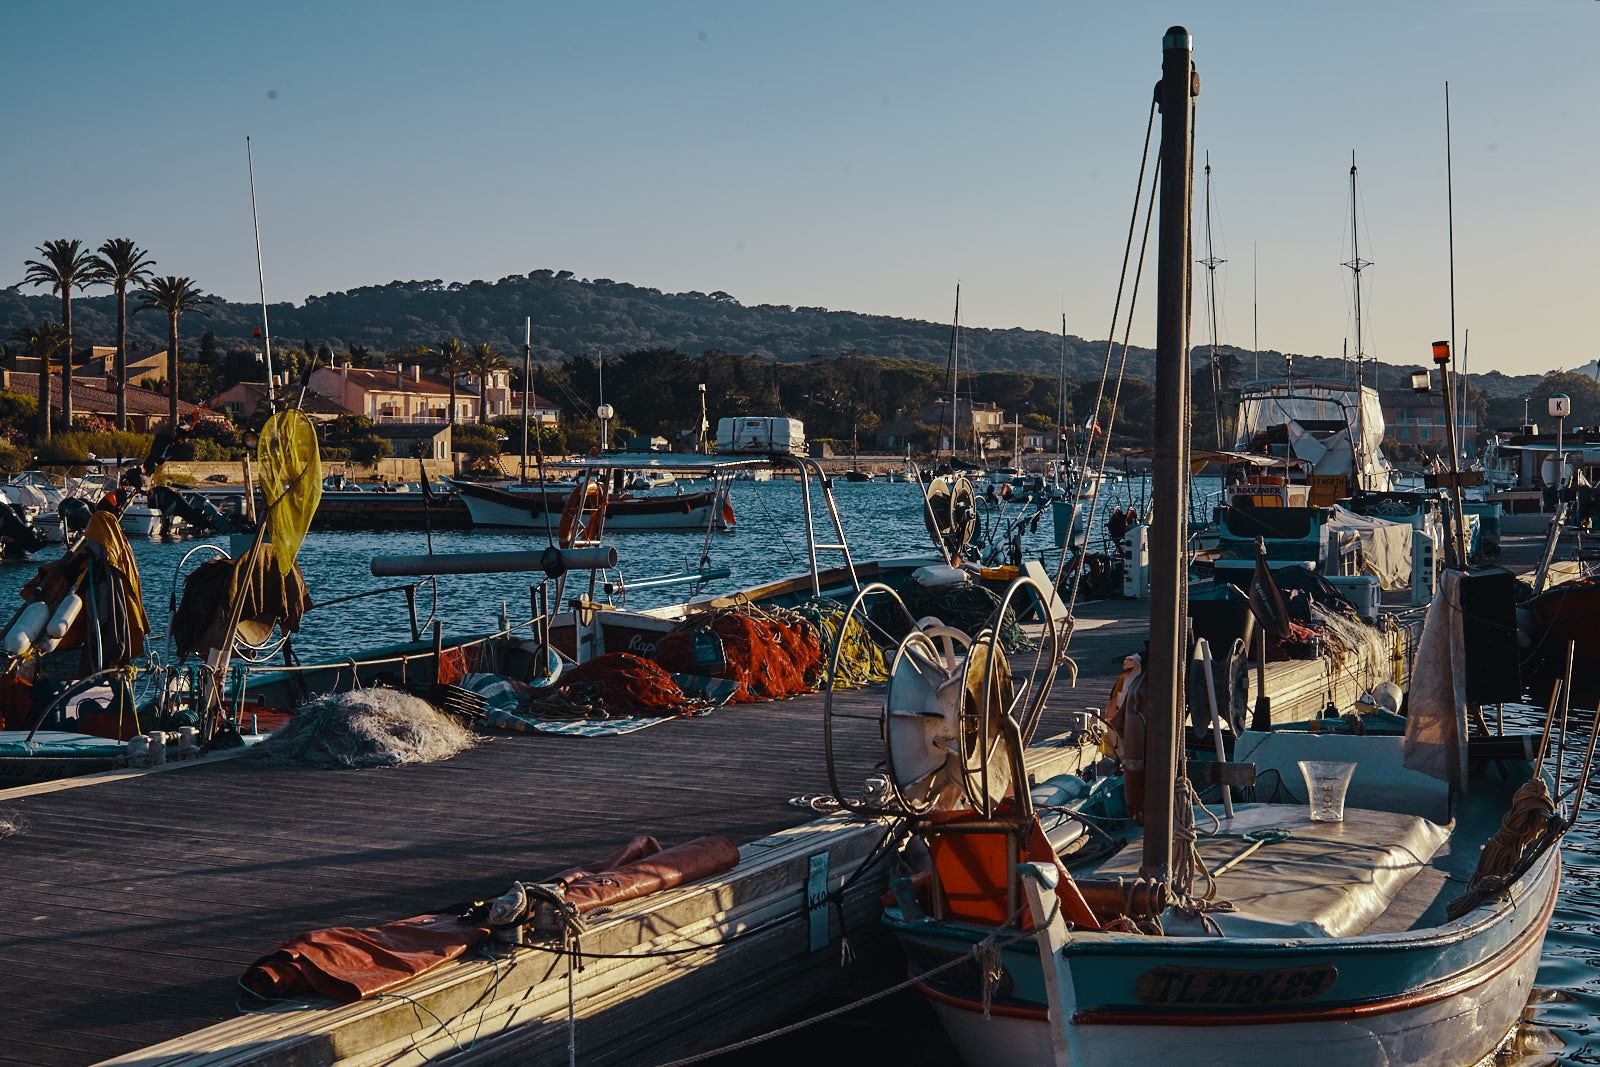 port de peche sur la Mediterranee